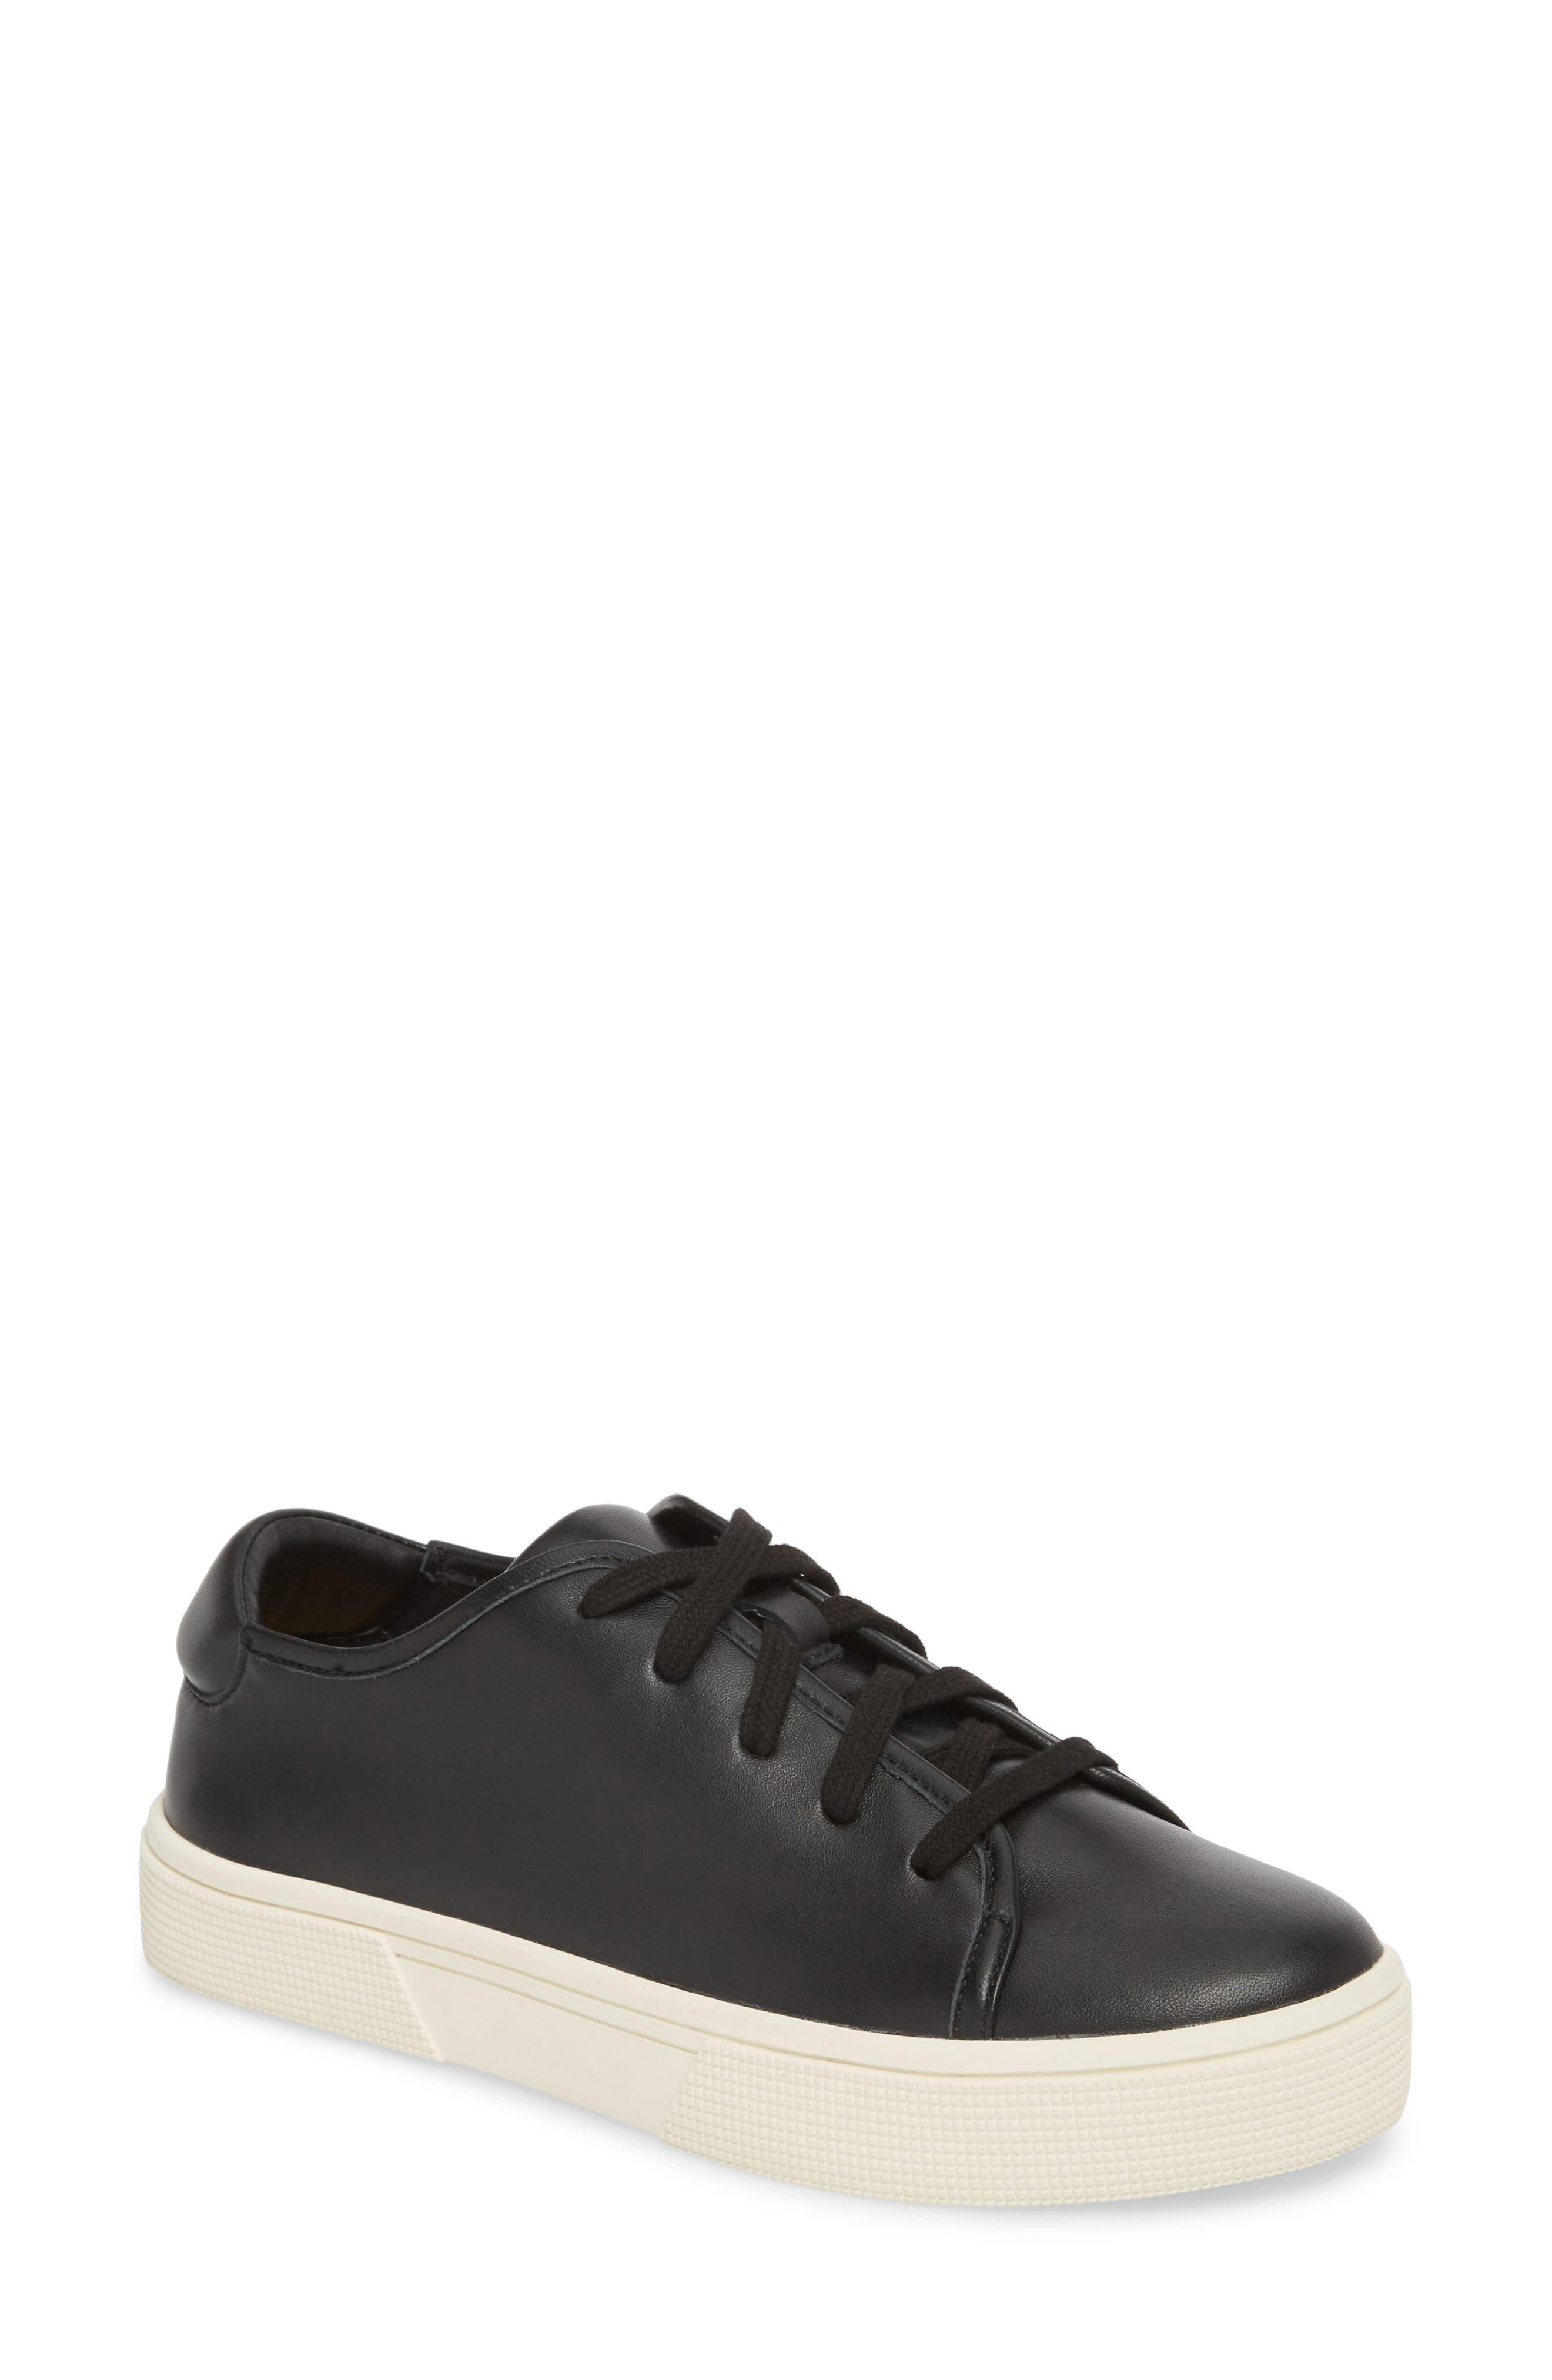 Norvin Sneaker,                         Main,                         color, BLACK LEATHER